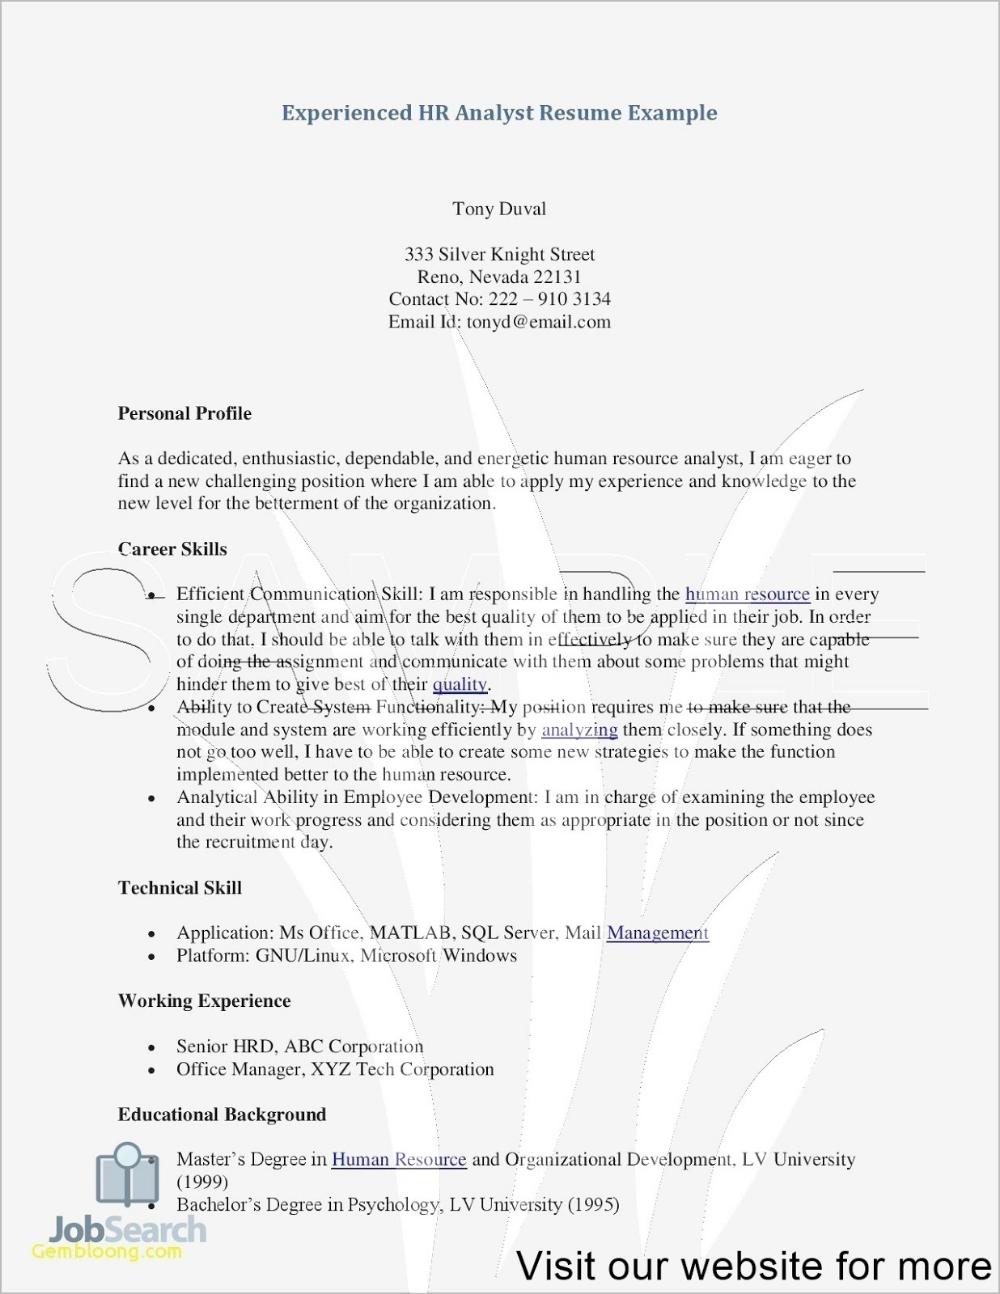 Office Administrator Resume Sample 2020 Office Administrator Resume Sample Office Administrator Curriculum Vitae In 2020 Resume Skills Resume Resume Template Free